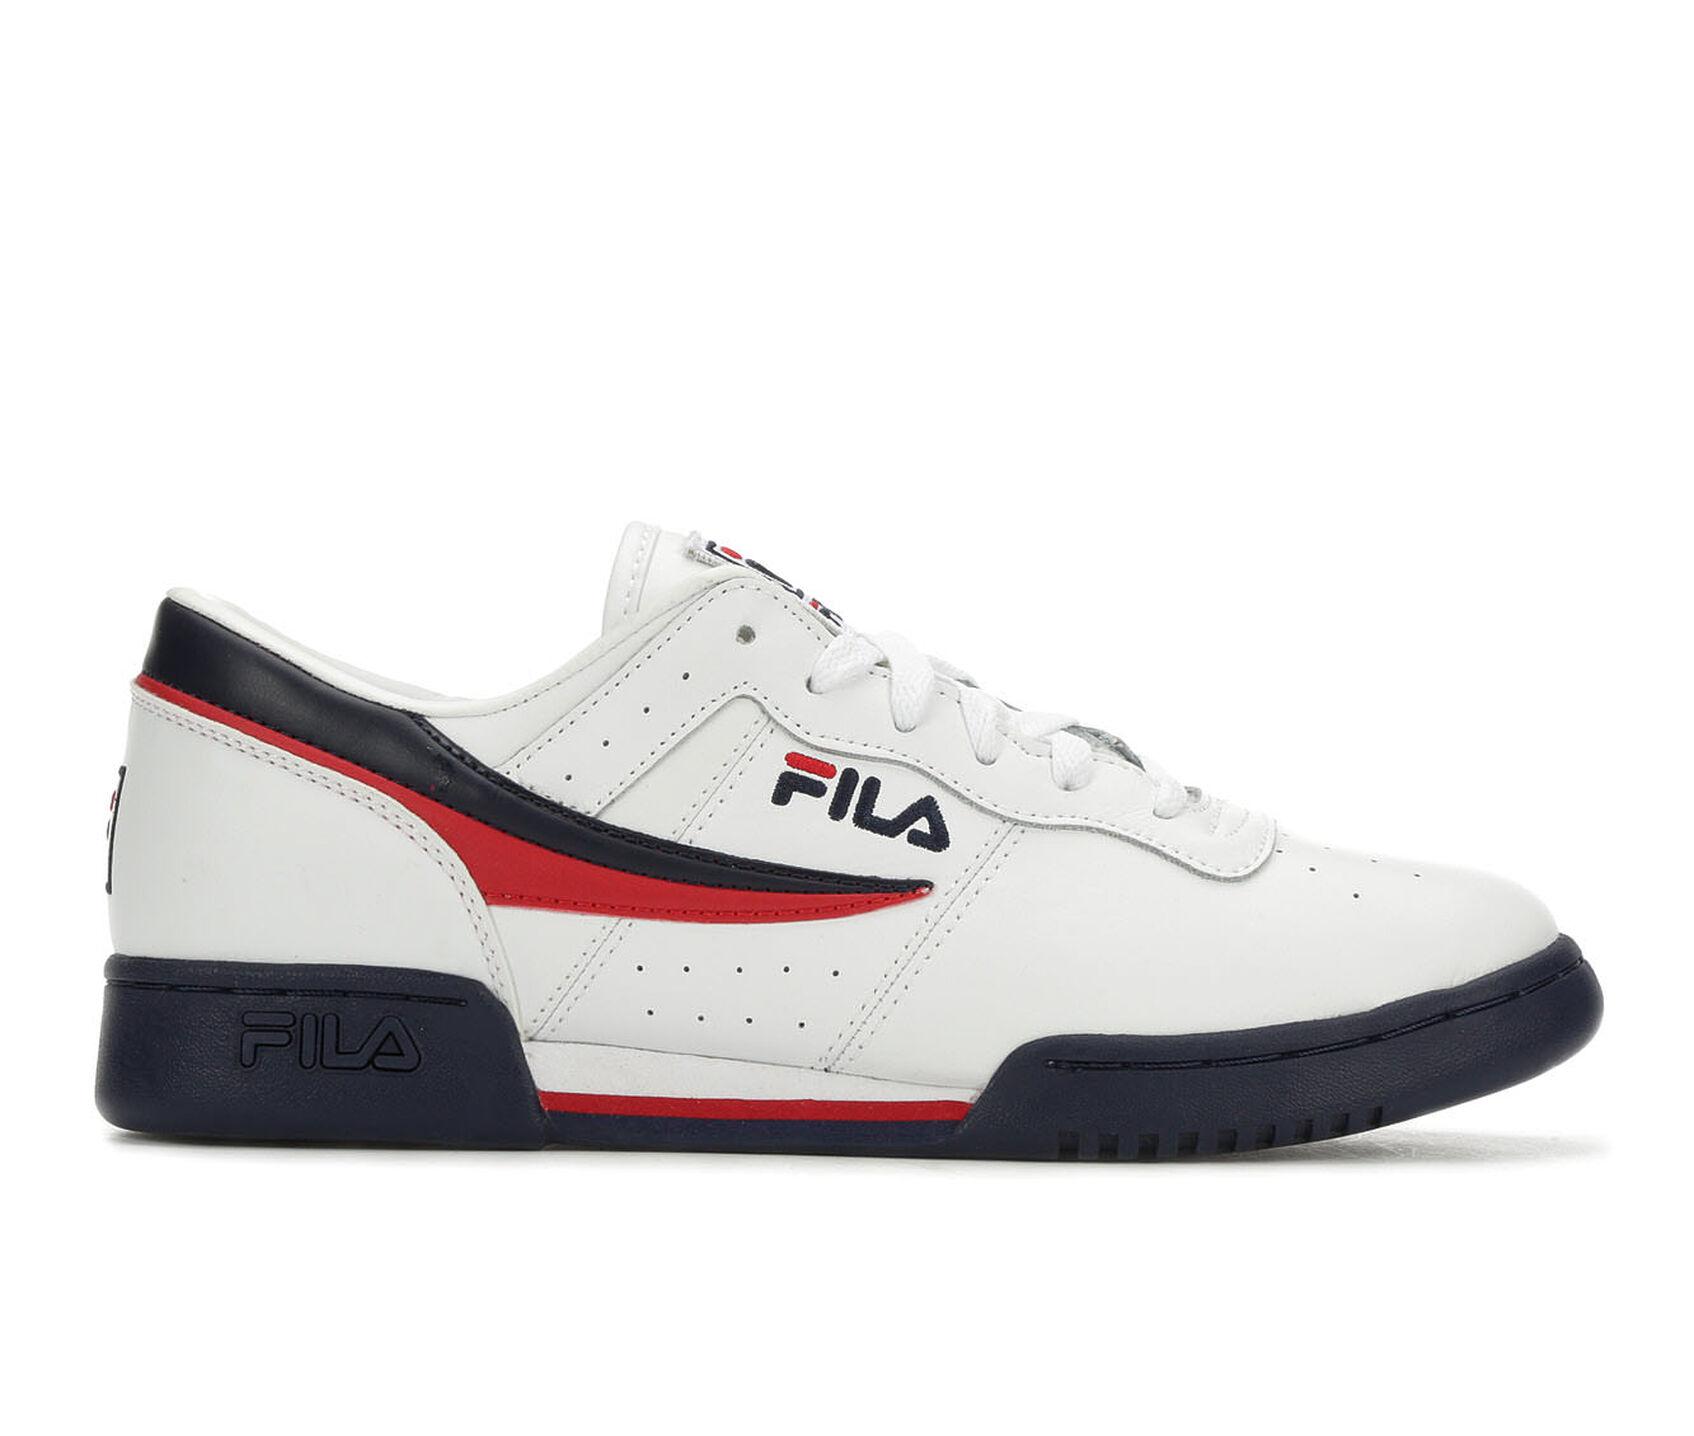 fa50fe8661 Men's Fila Original Fitness Retro Sneakers